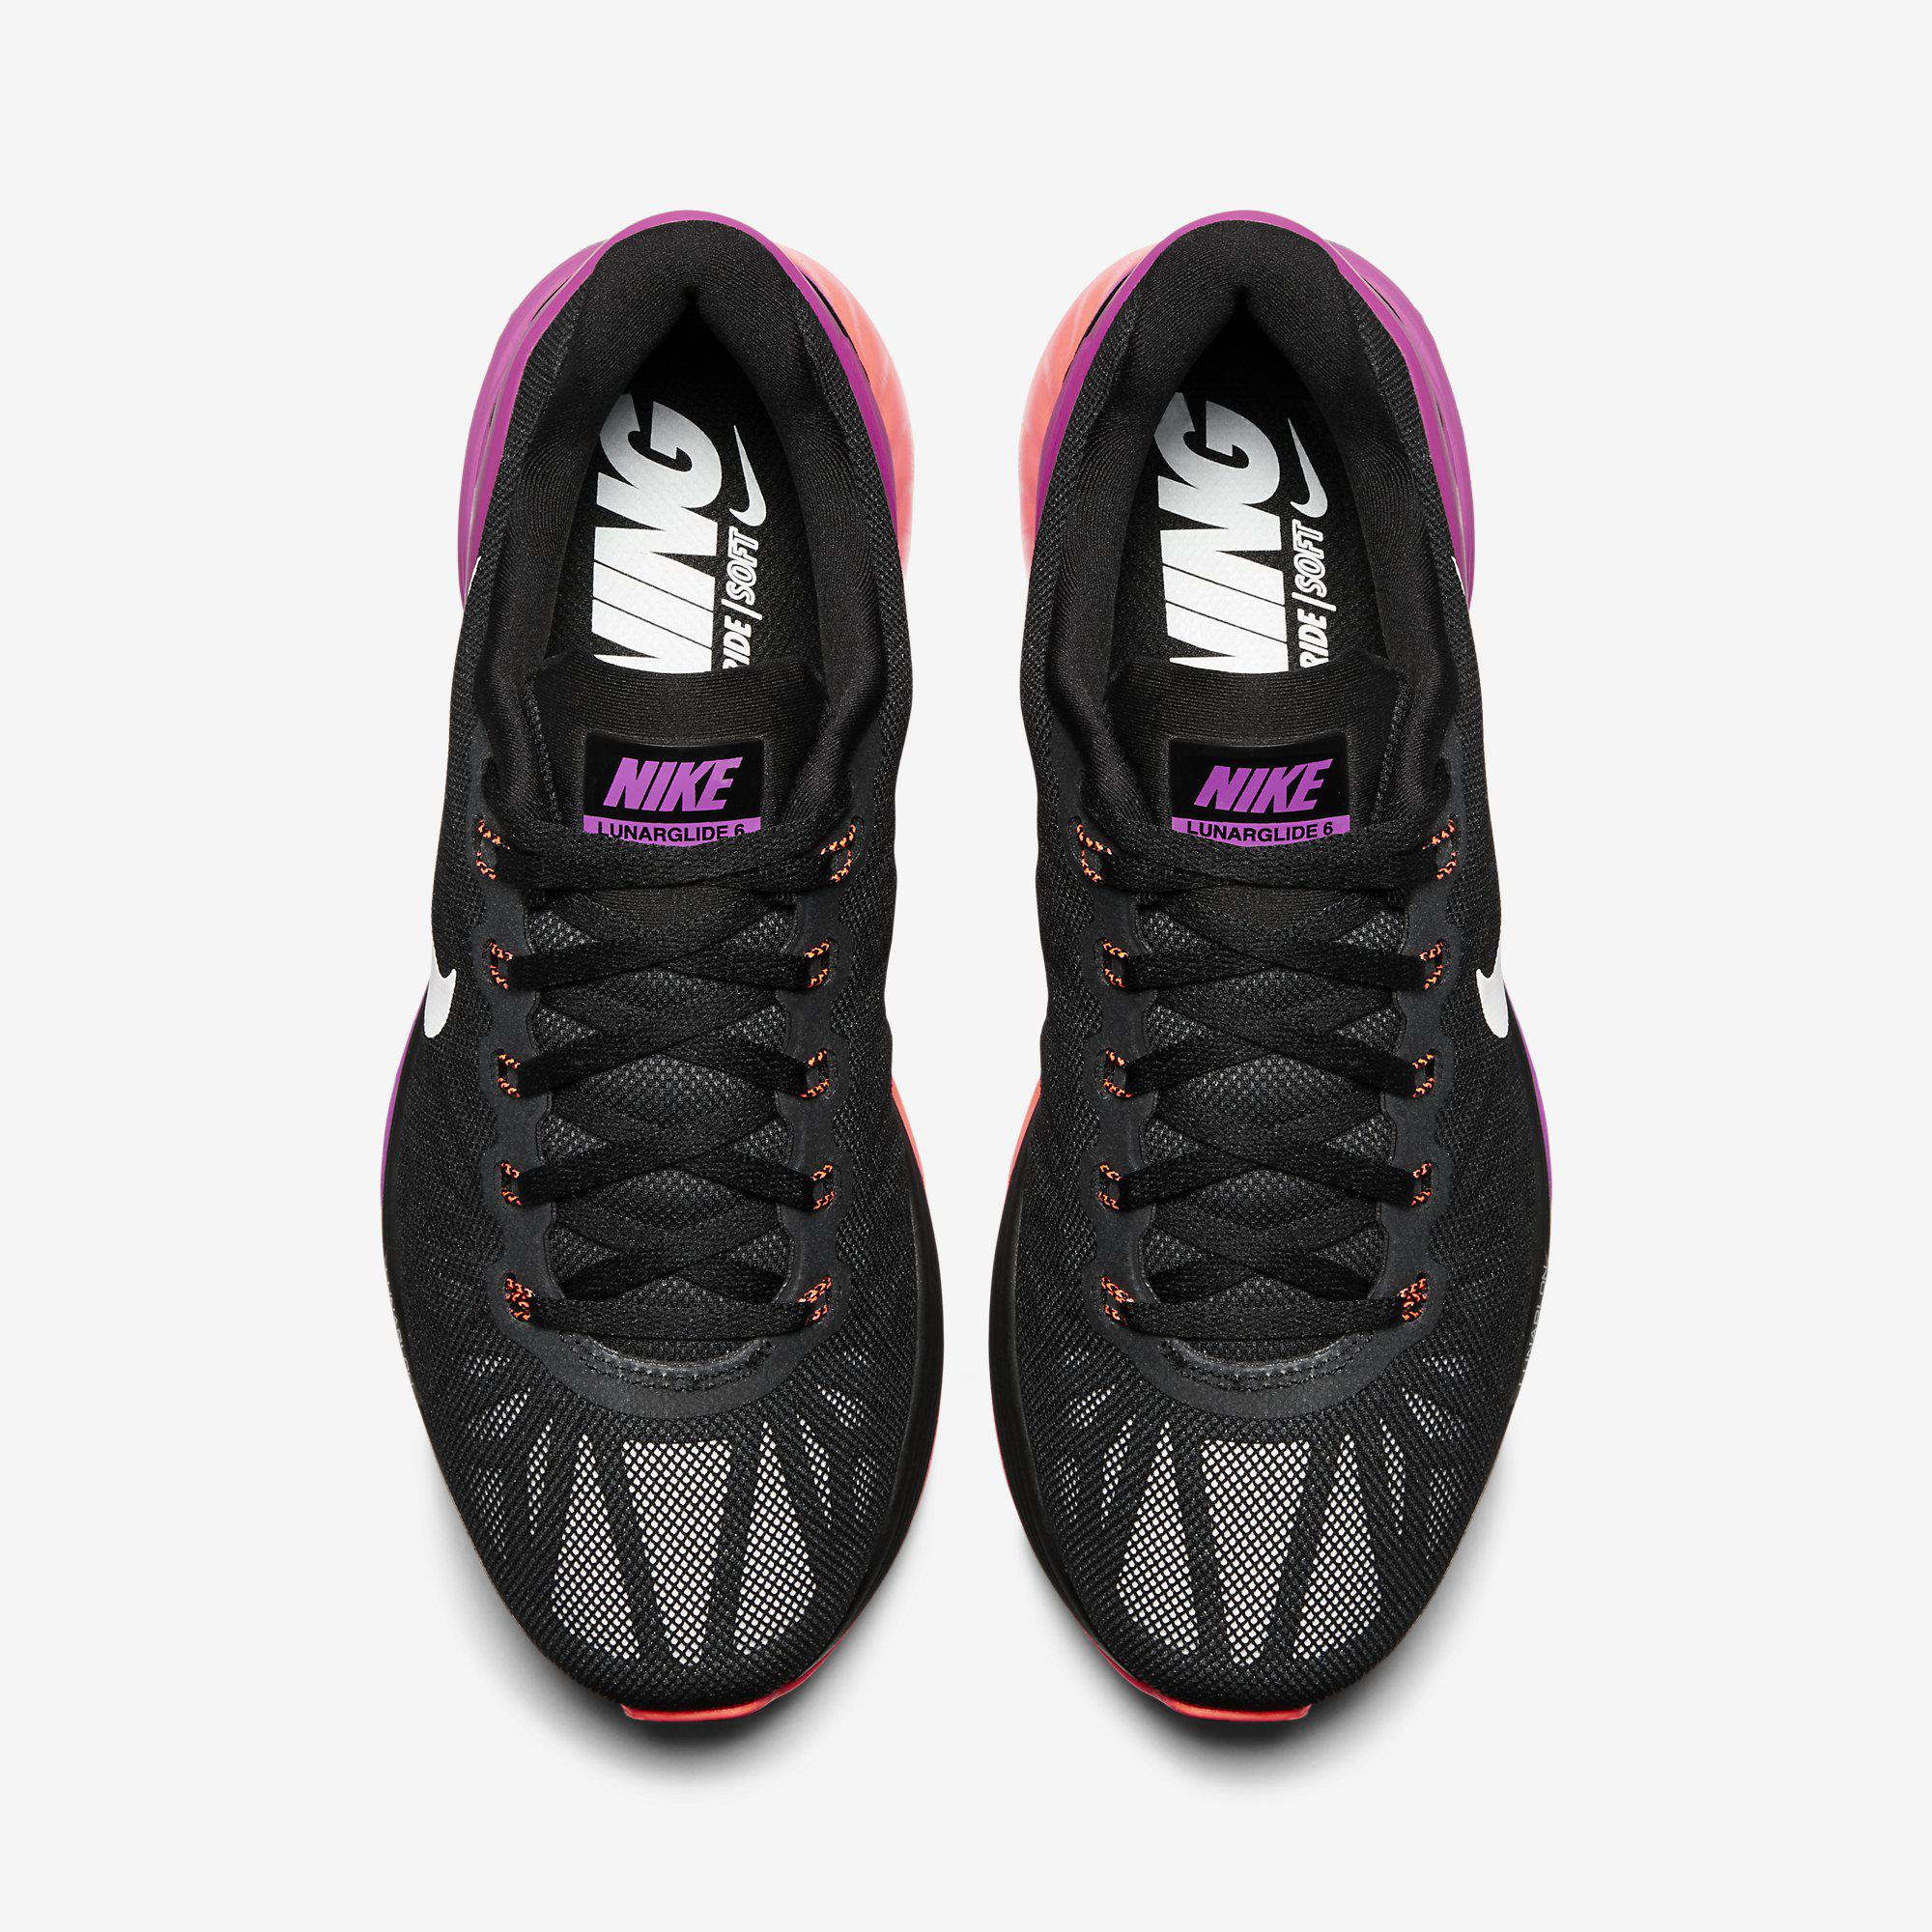 new arrival 5fd52 7cea1 Nike Womens LunarGlide 6 Running Shoes - Black/Fuchsia Flash